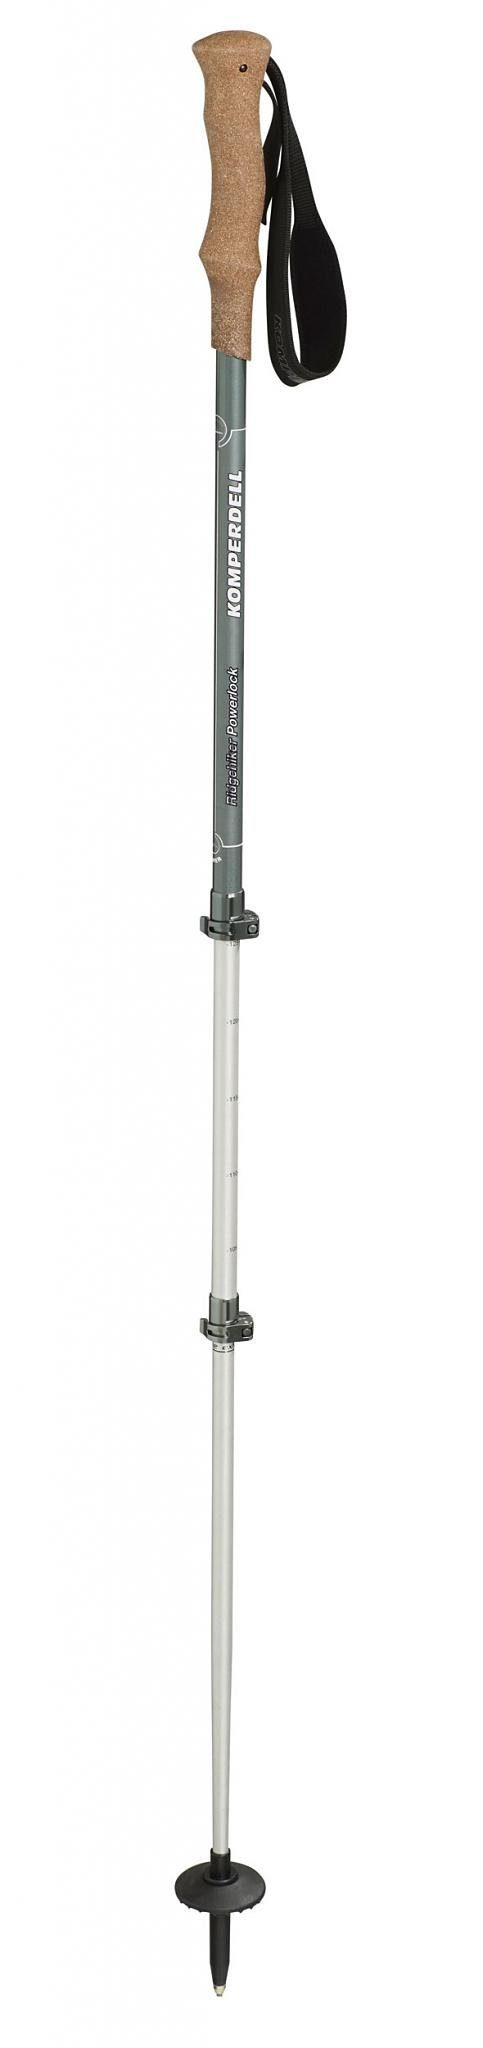 Komperdell Wanderstock »Ridgehiker Cork Powerlock Poles«